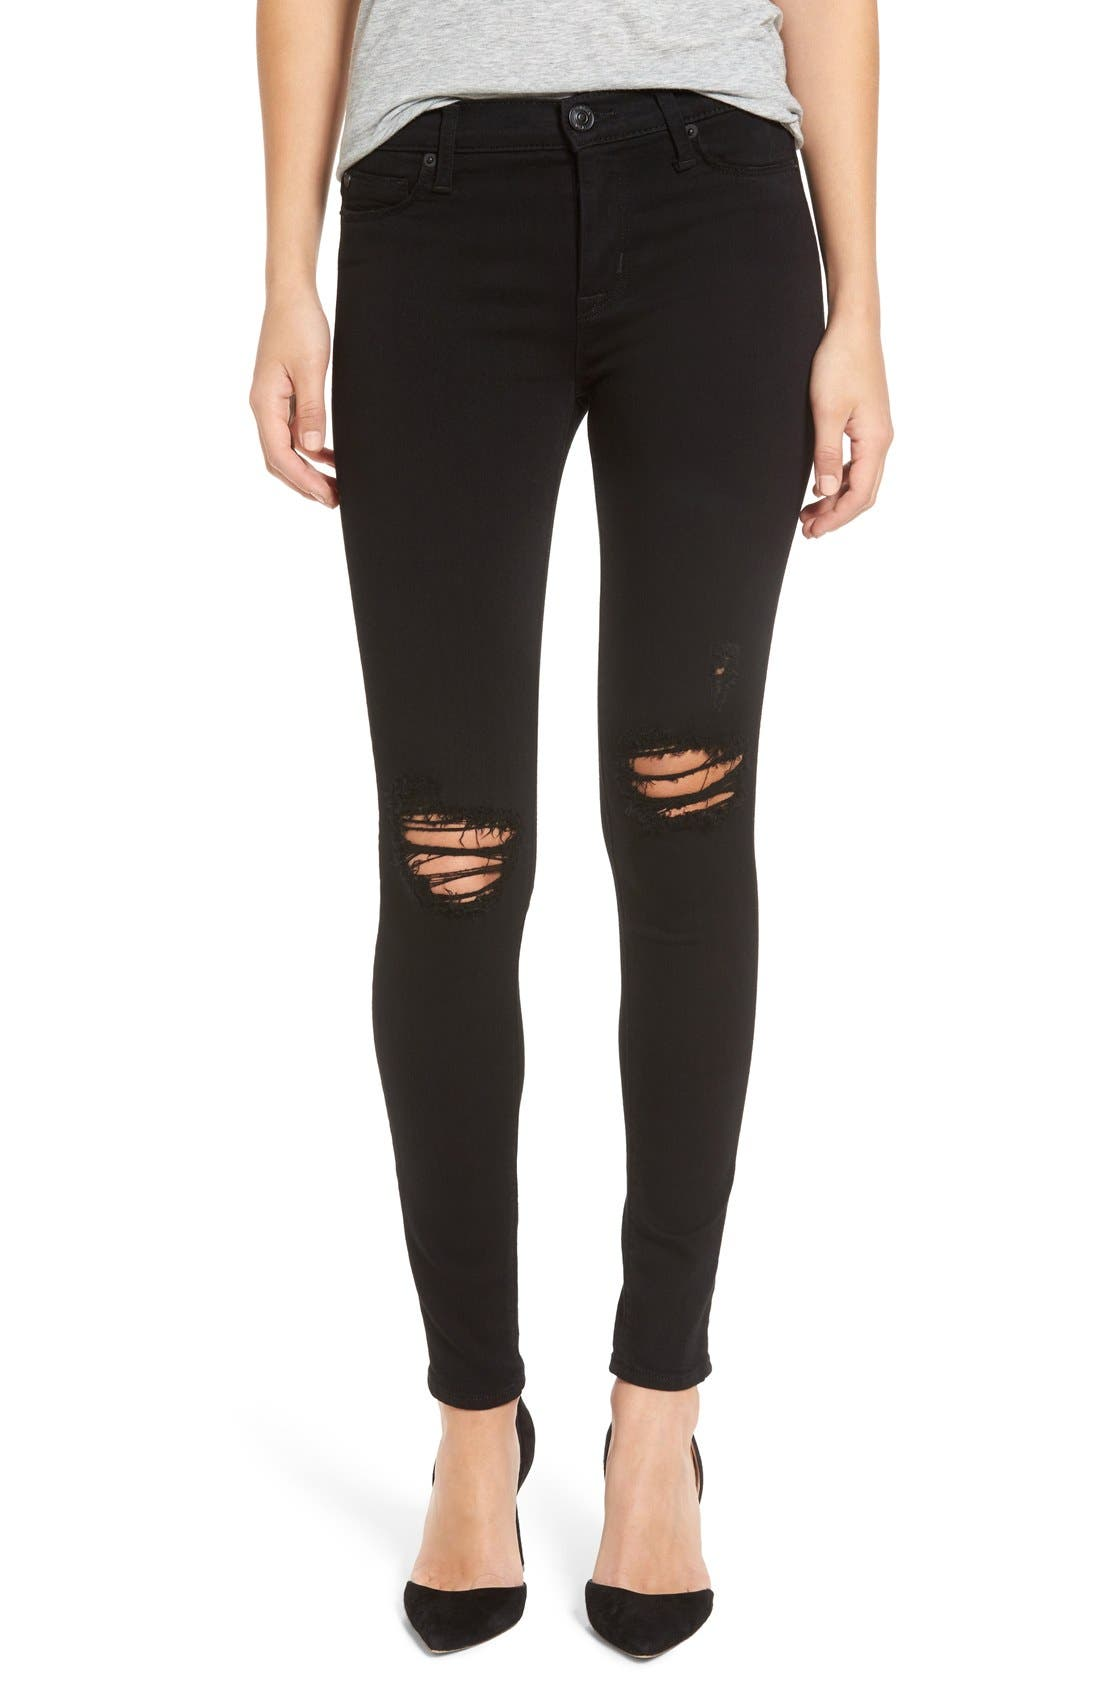 HUDSON JEANS 'Nico' Skinny Jeans, Main, color, 001